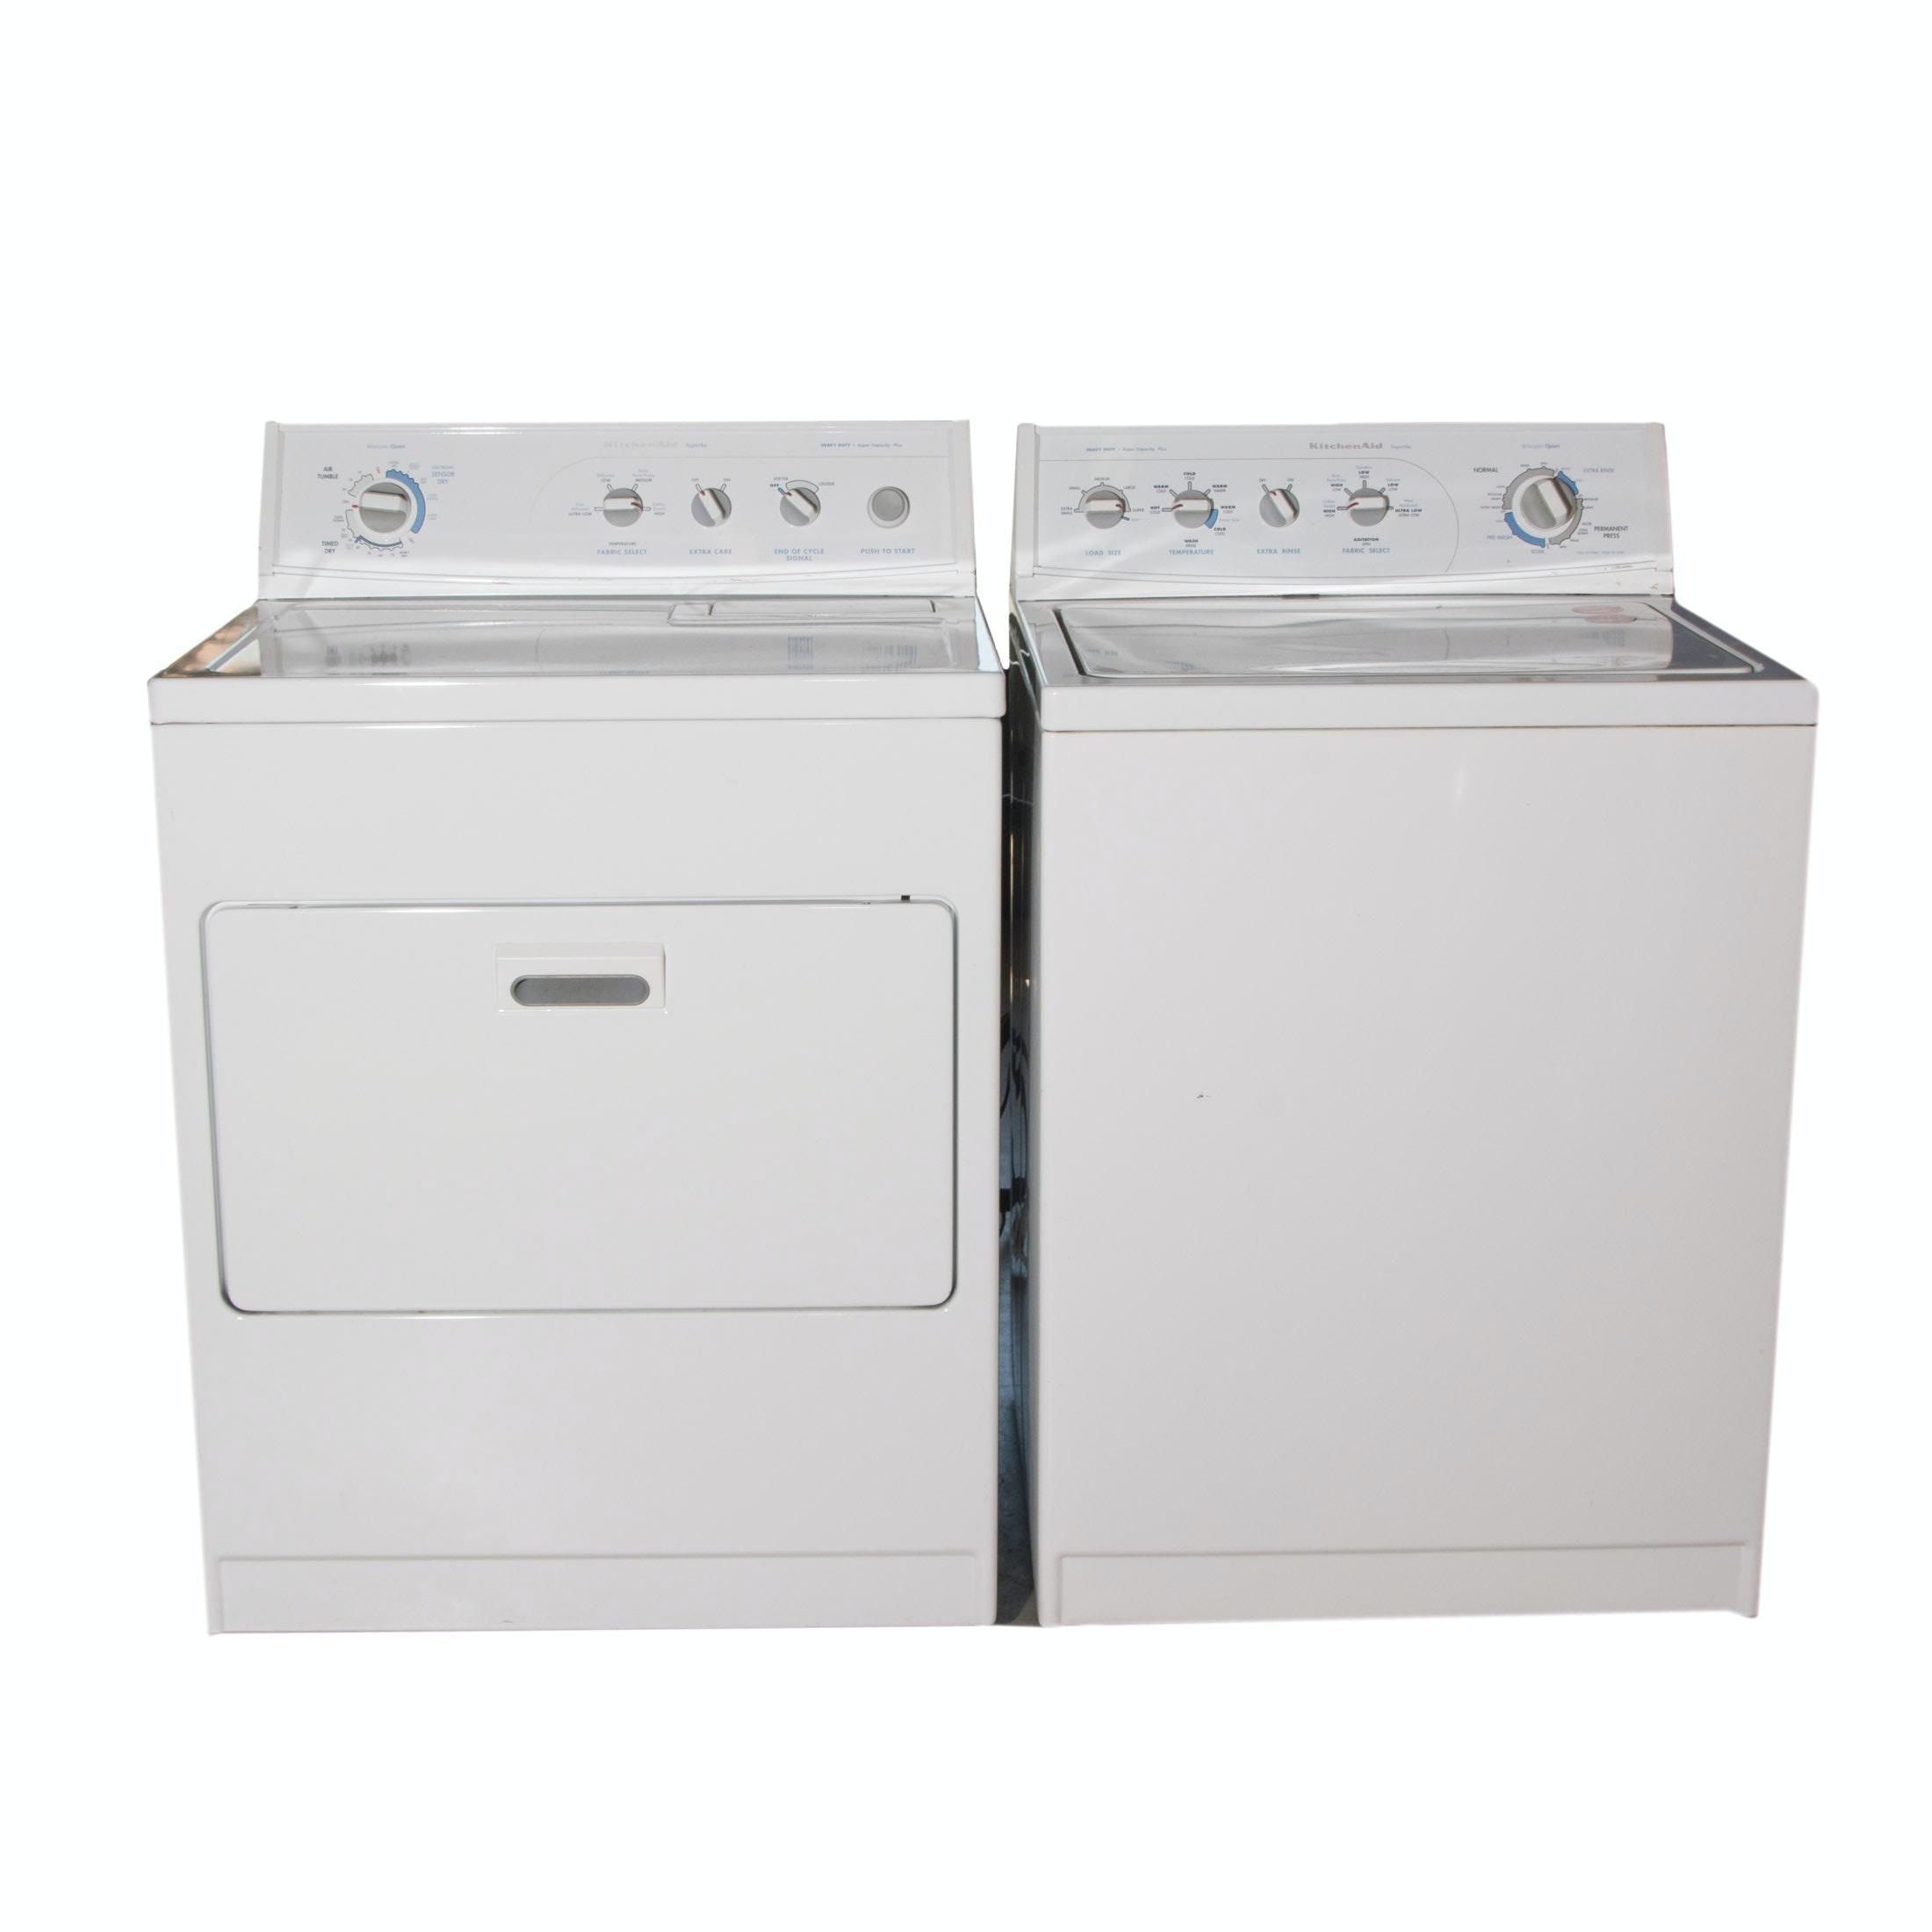 KitchenAid Washer And Dryer ...